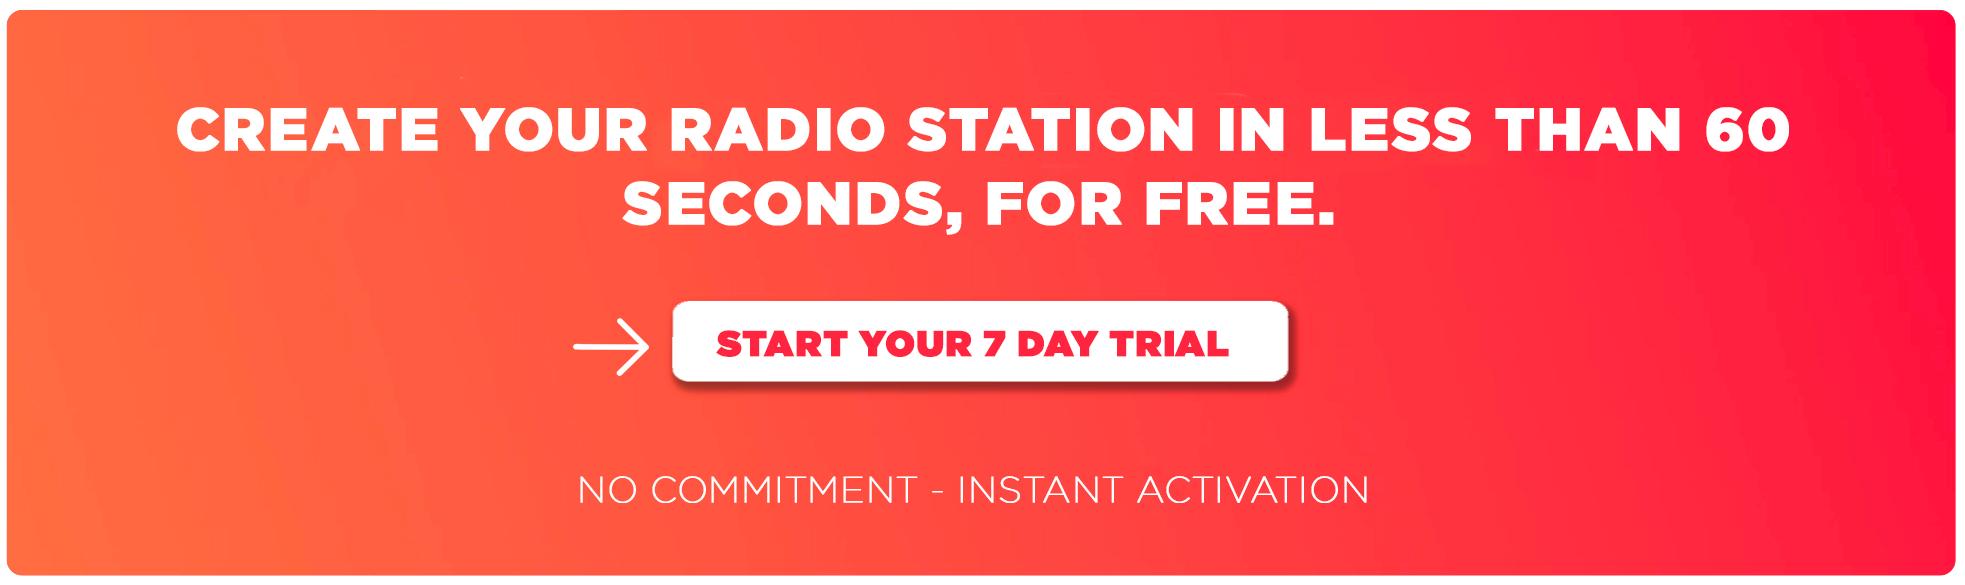 make a radio station for free